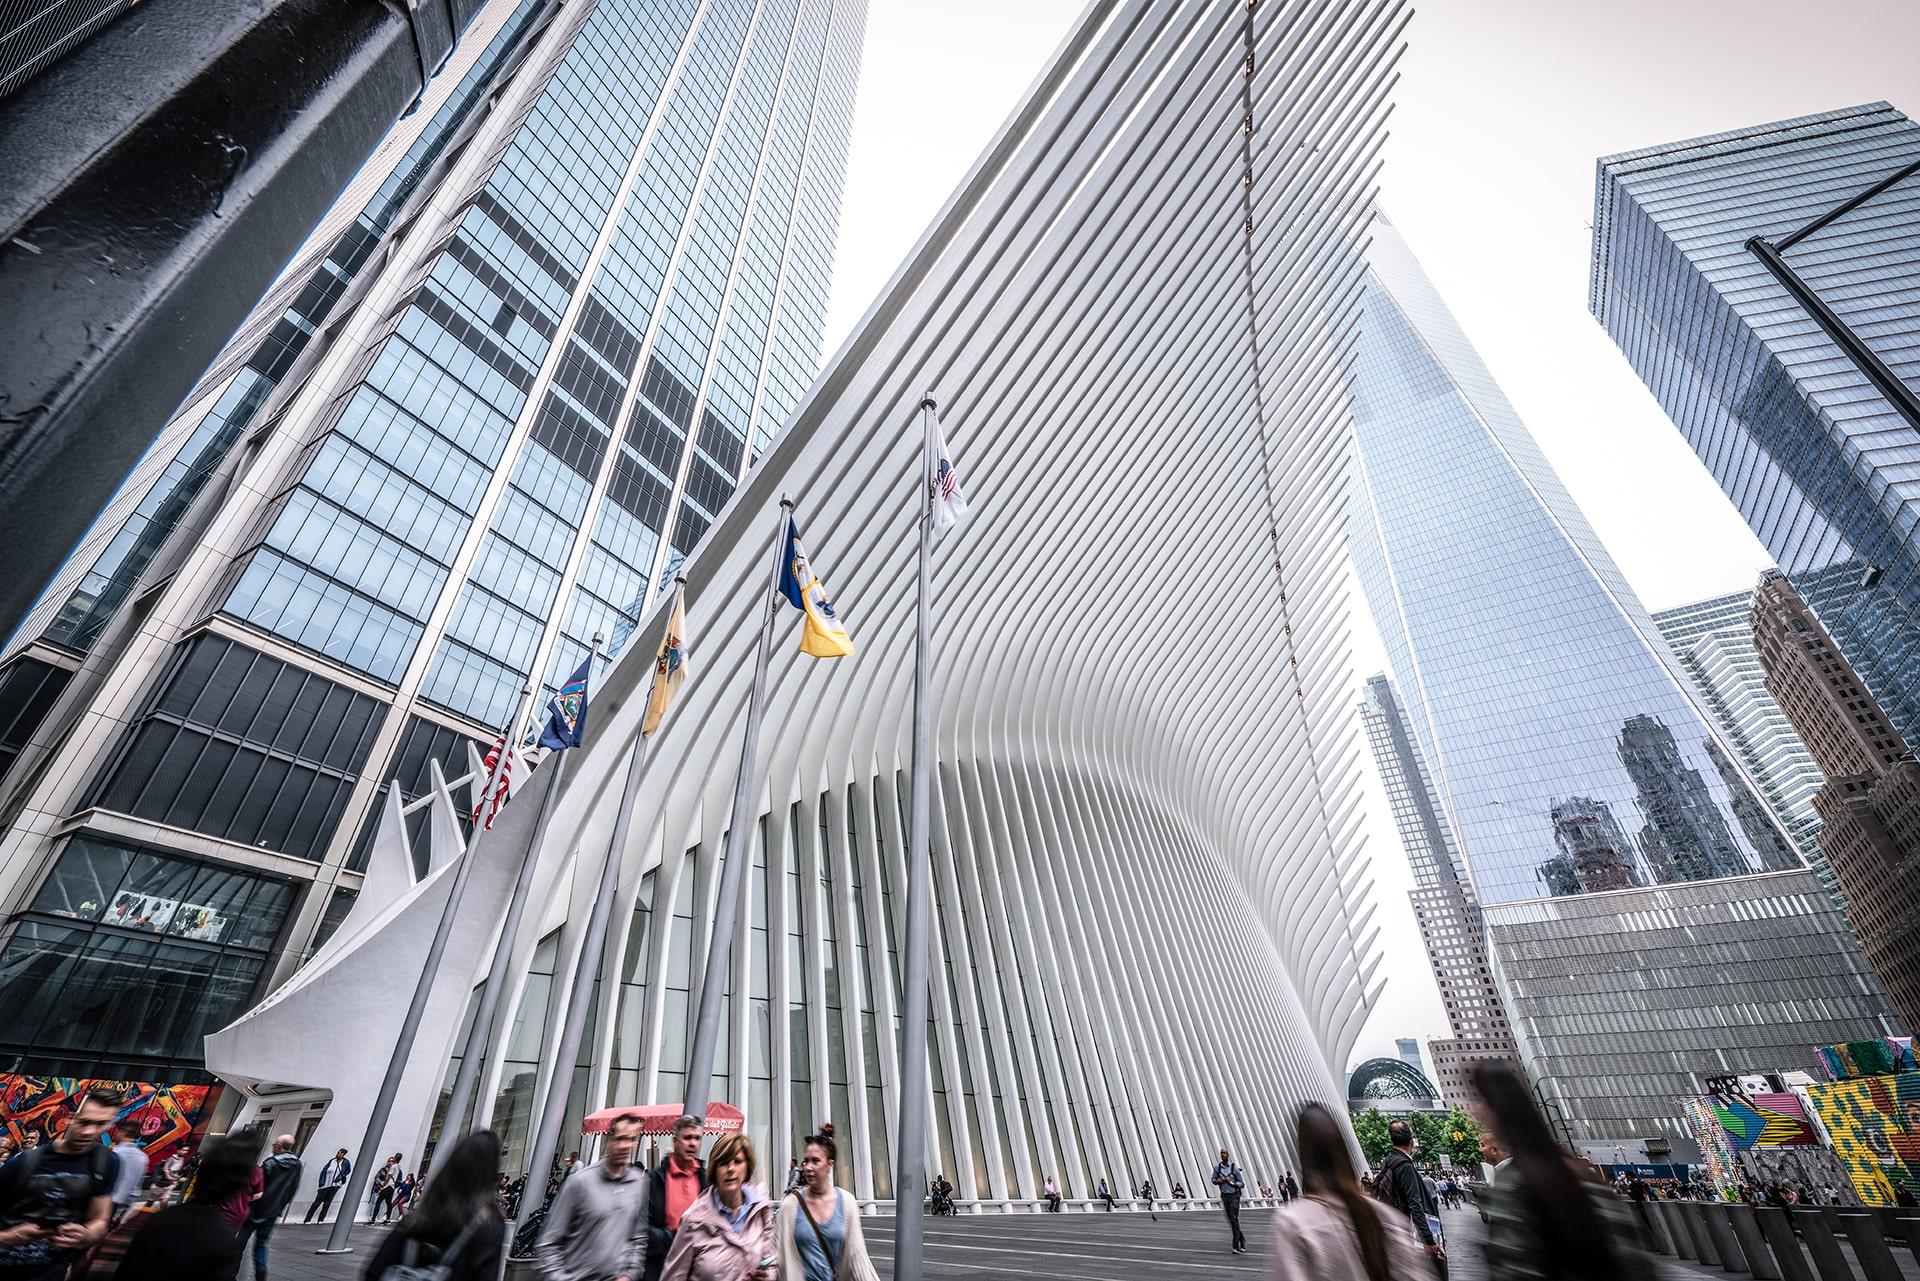 Blog Lifestyle - Gare The Oculus, un monument architectural impressionnant - Suivre sa Joie - Saskia Parein